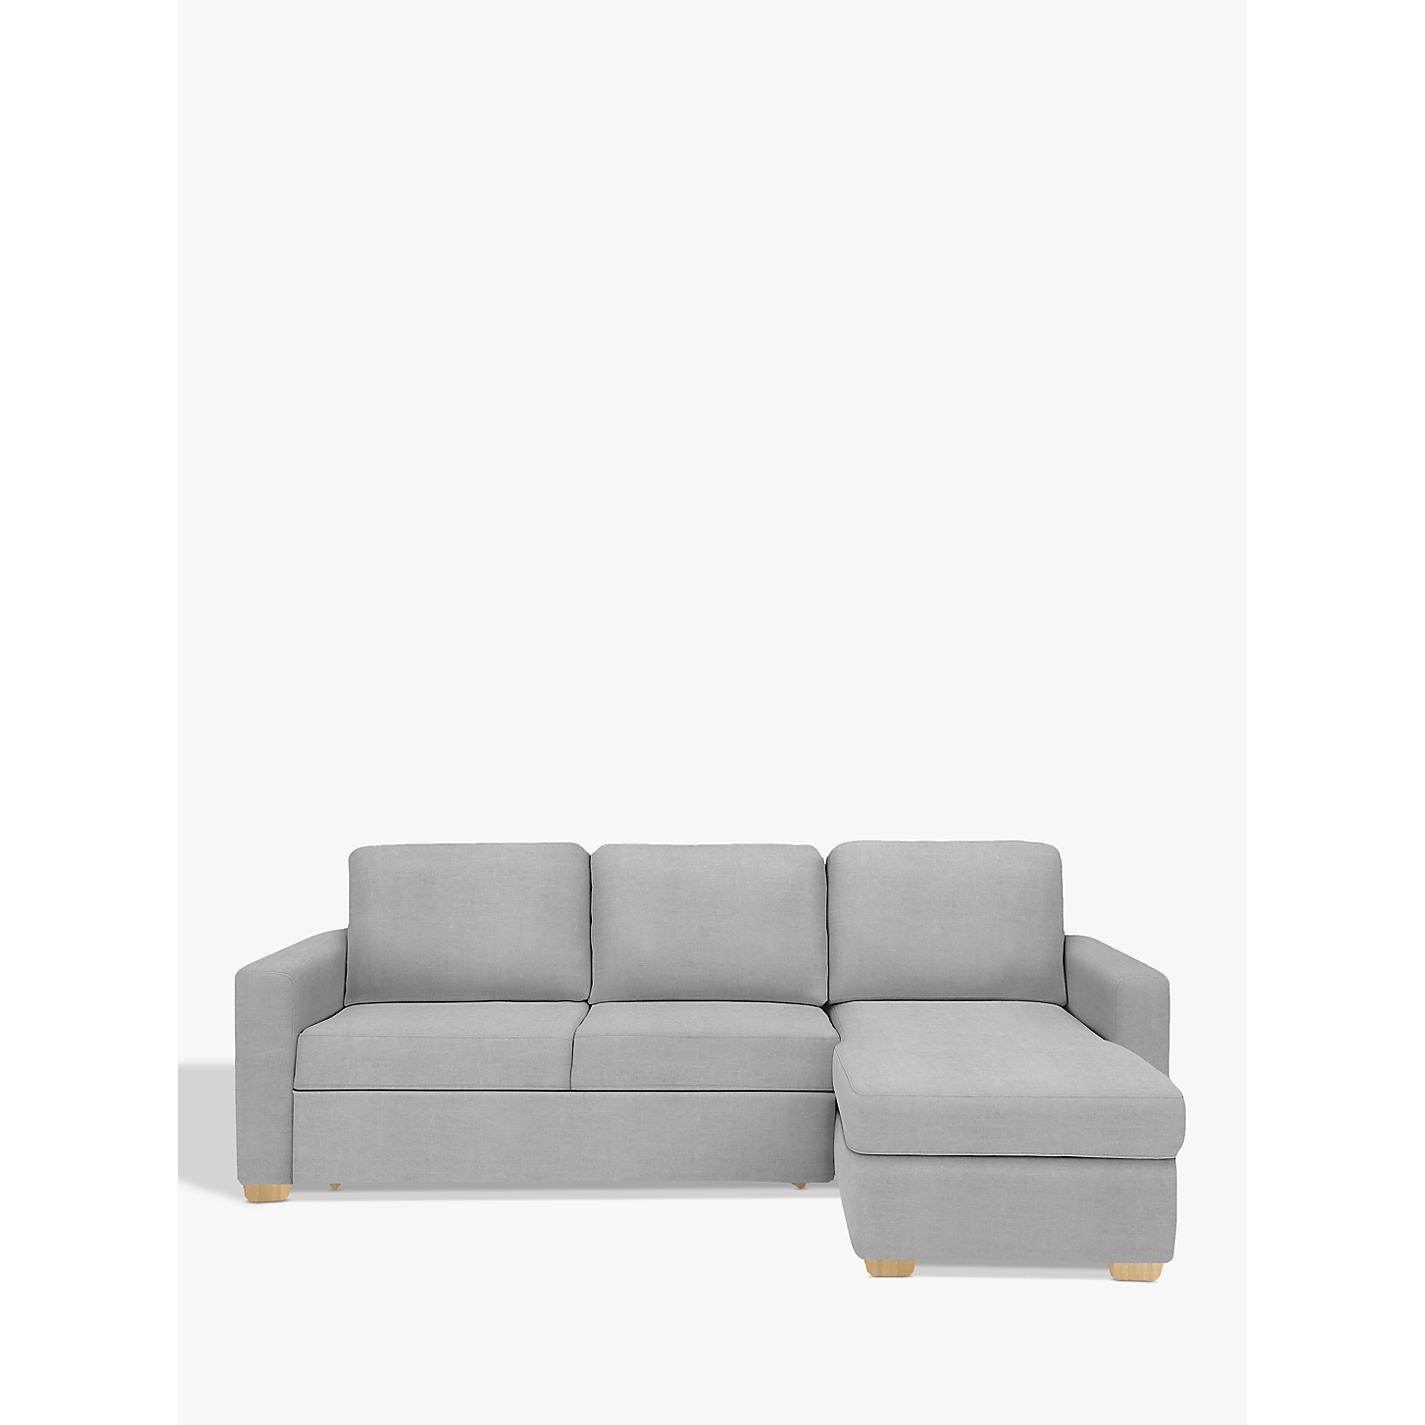 Buy John Lewis Sacha Sofa Bed with Foam Mattress Light Leg